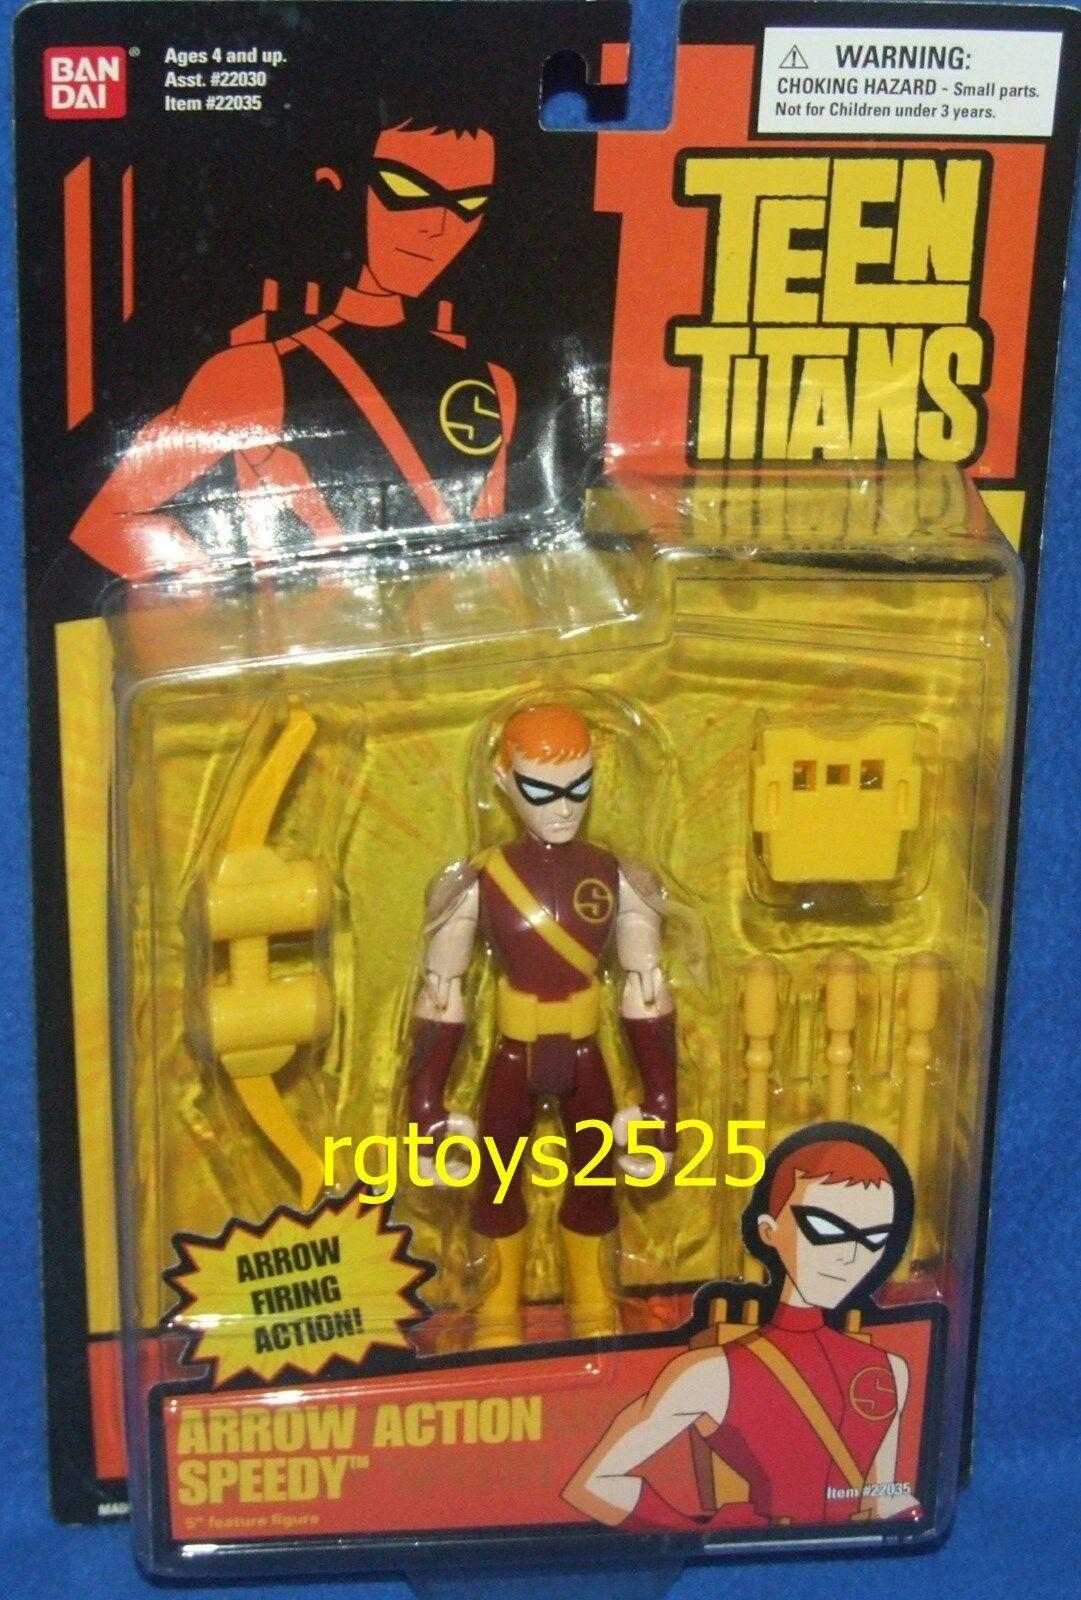 Teen Titans Arrow Action Speedy New Factory Sealed 2005 D C COMIC